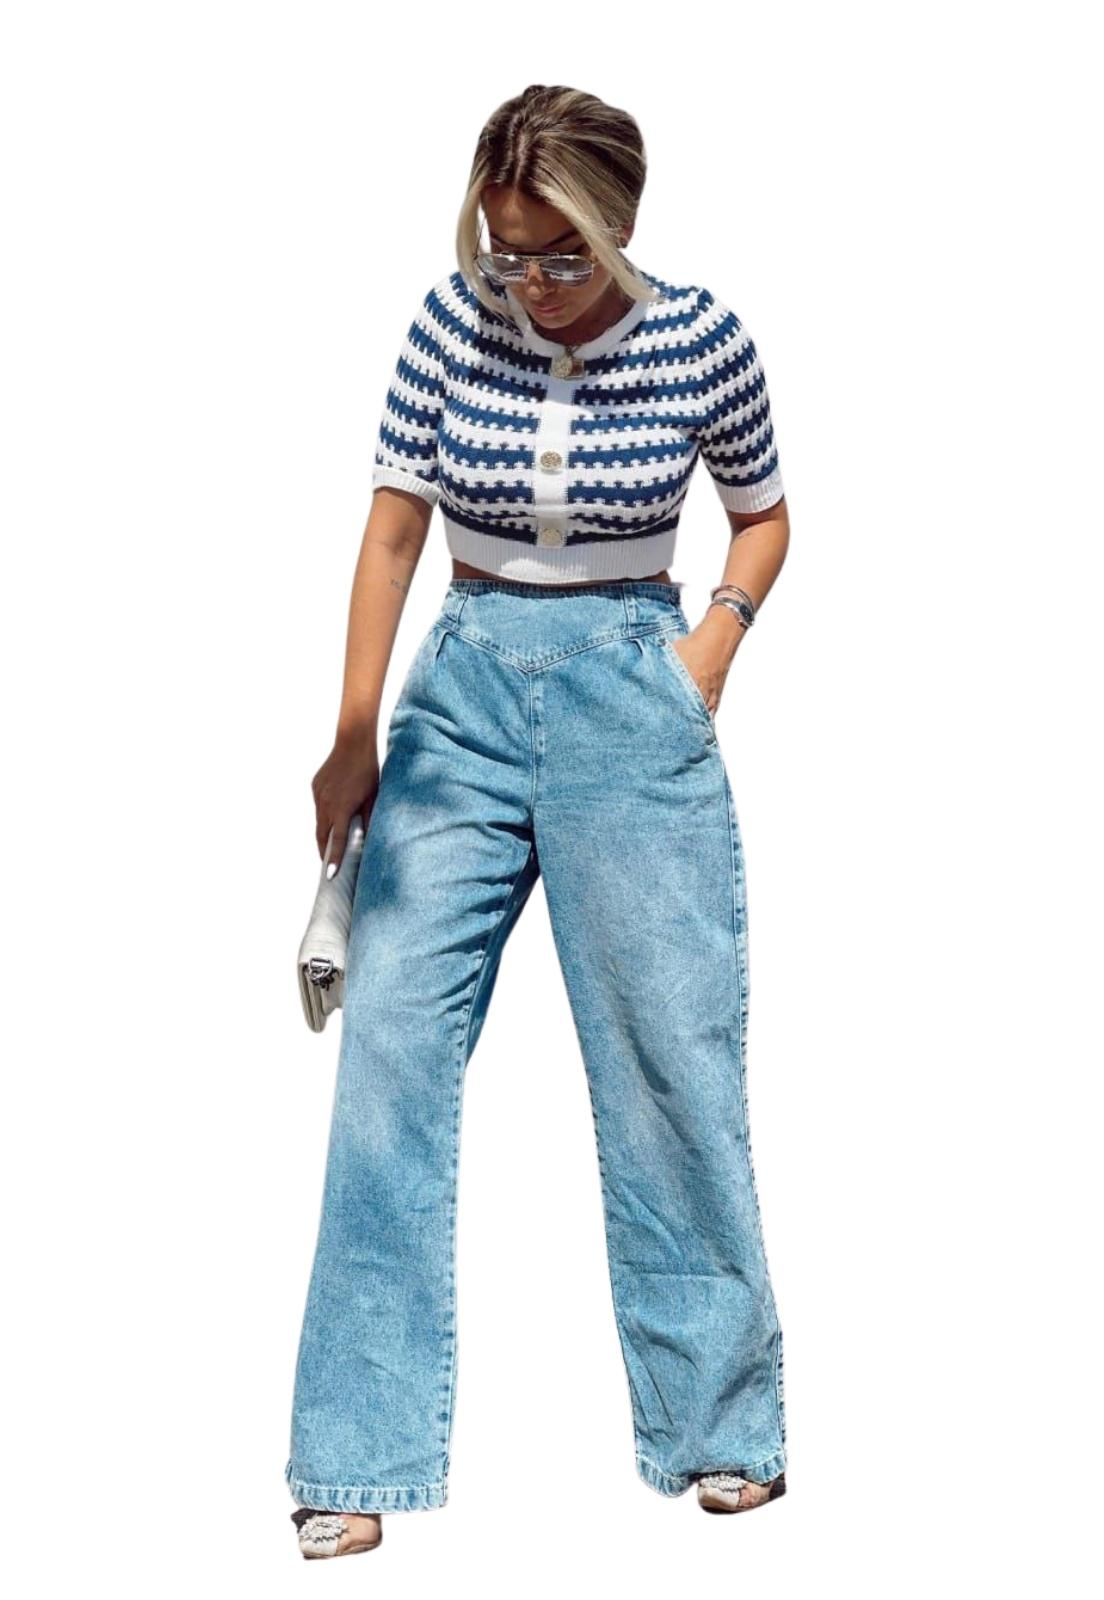 Calça Feminina Jeans Claro Pantalona Detalhe Elástico